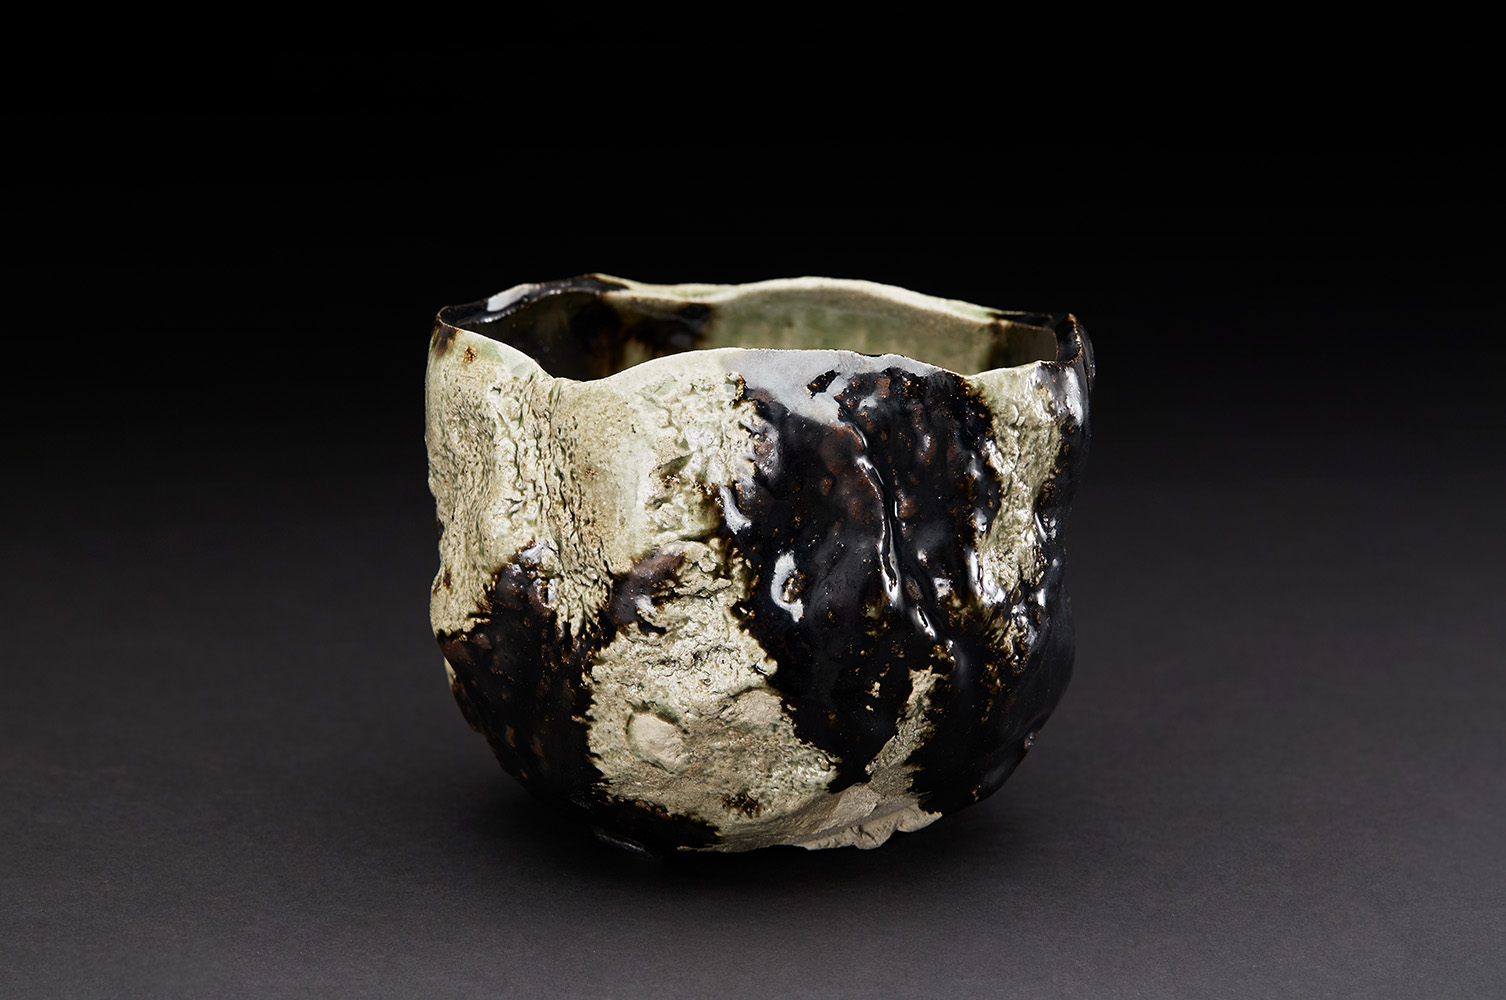 Osamu Inayoshi  Hikidashi Black Karinuki Tea Bowl  , 2018 Ceramic 4.25 x 4.75 x 5.5 inches 10.8 x 12.1 x 14 cm Oin 16